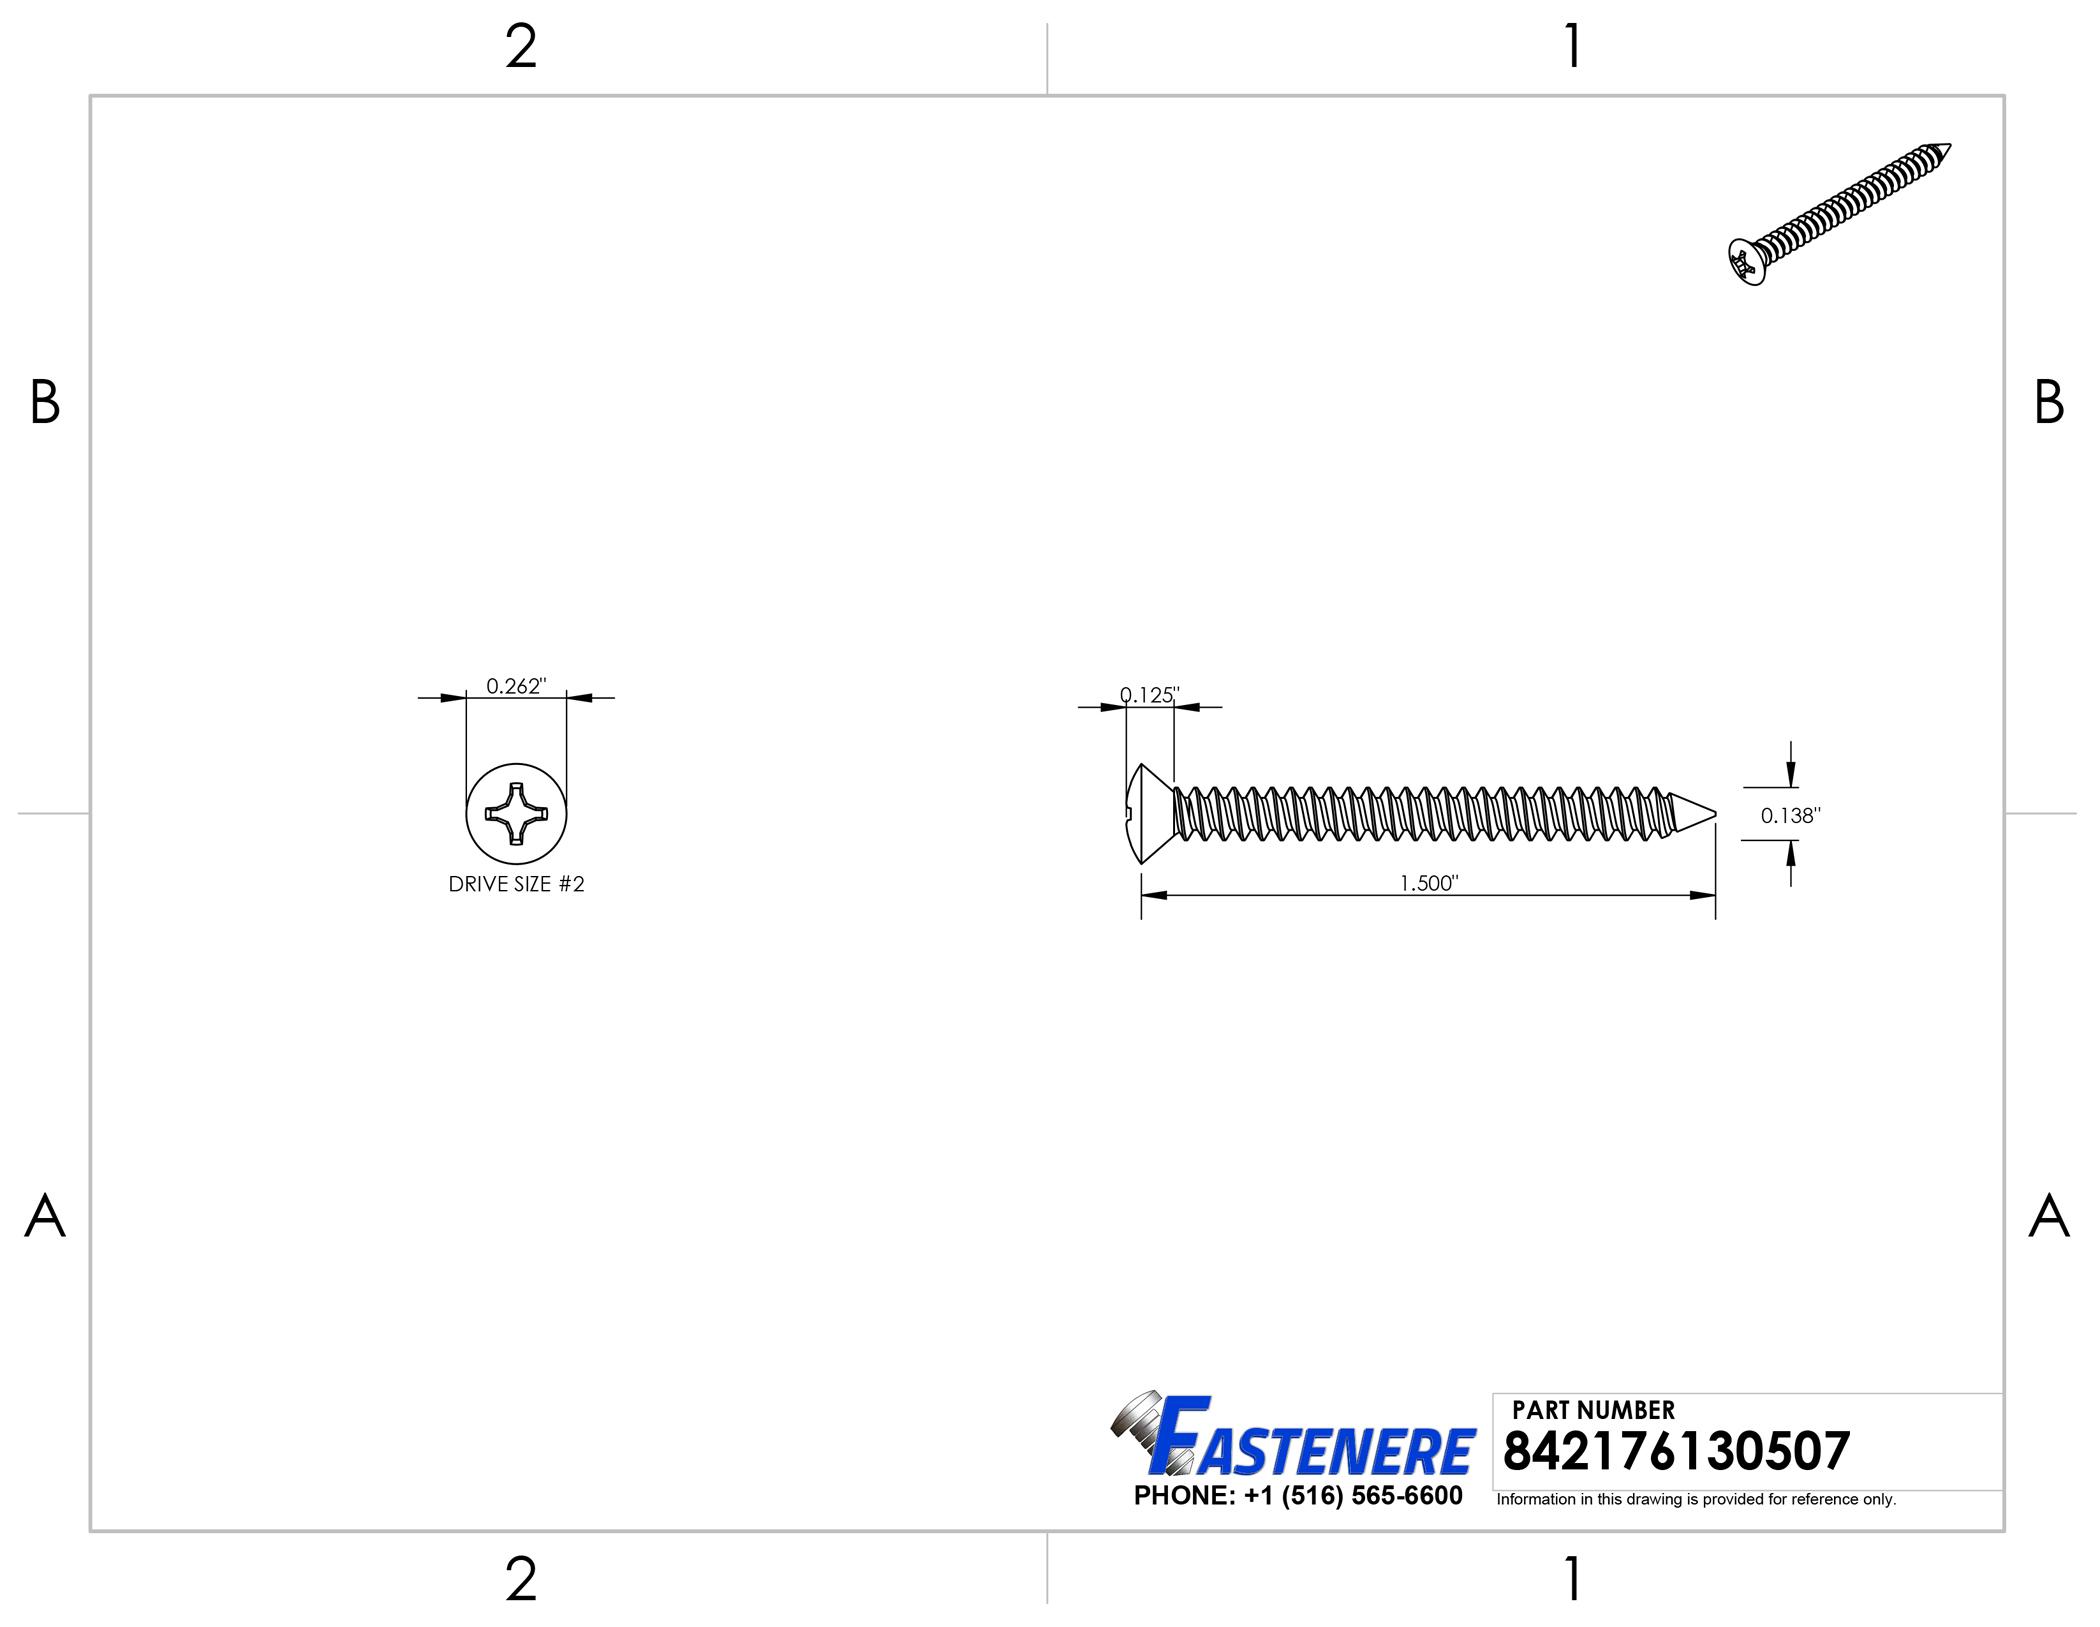 100, 6 x 1//2 #6 Phillips Oval Head Sheet Metal Screws 18-8 Stainless Steel